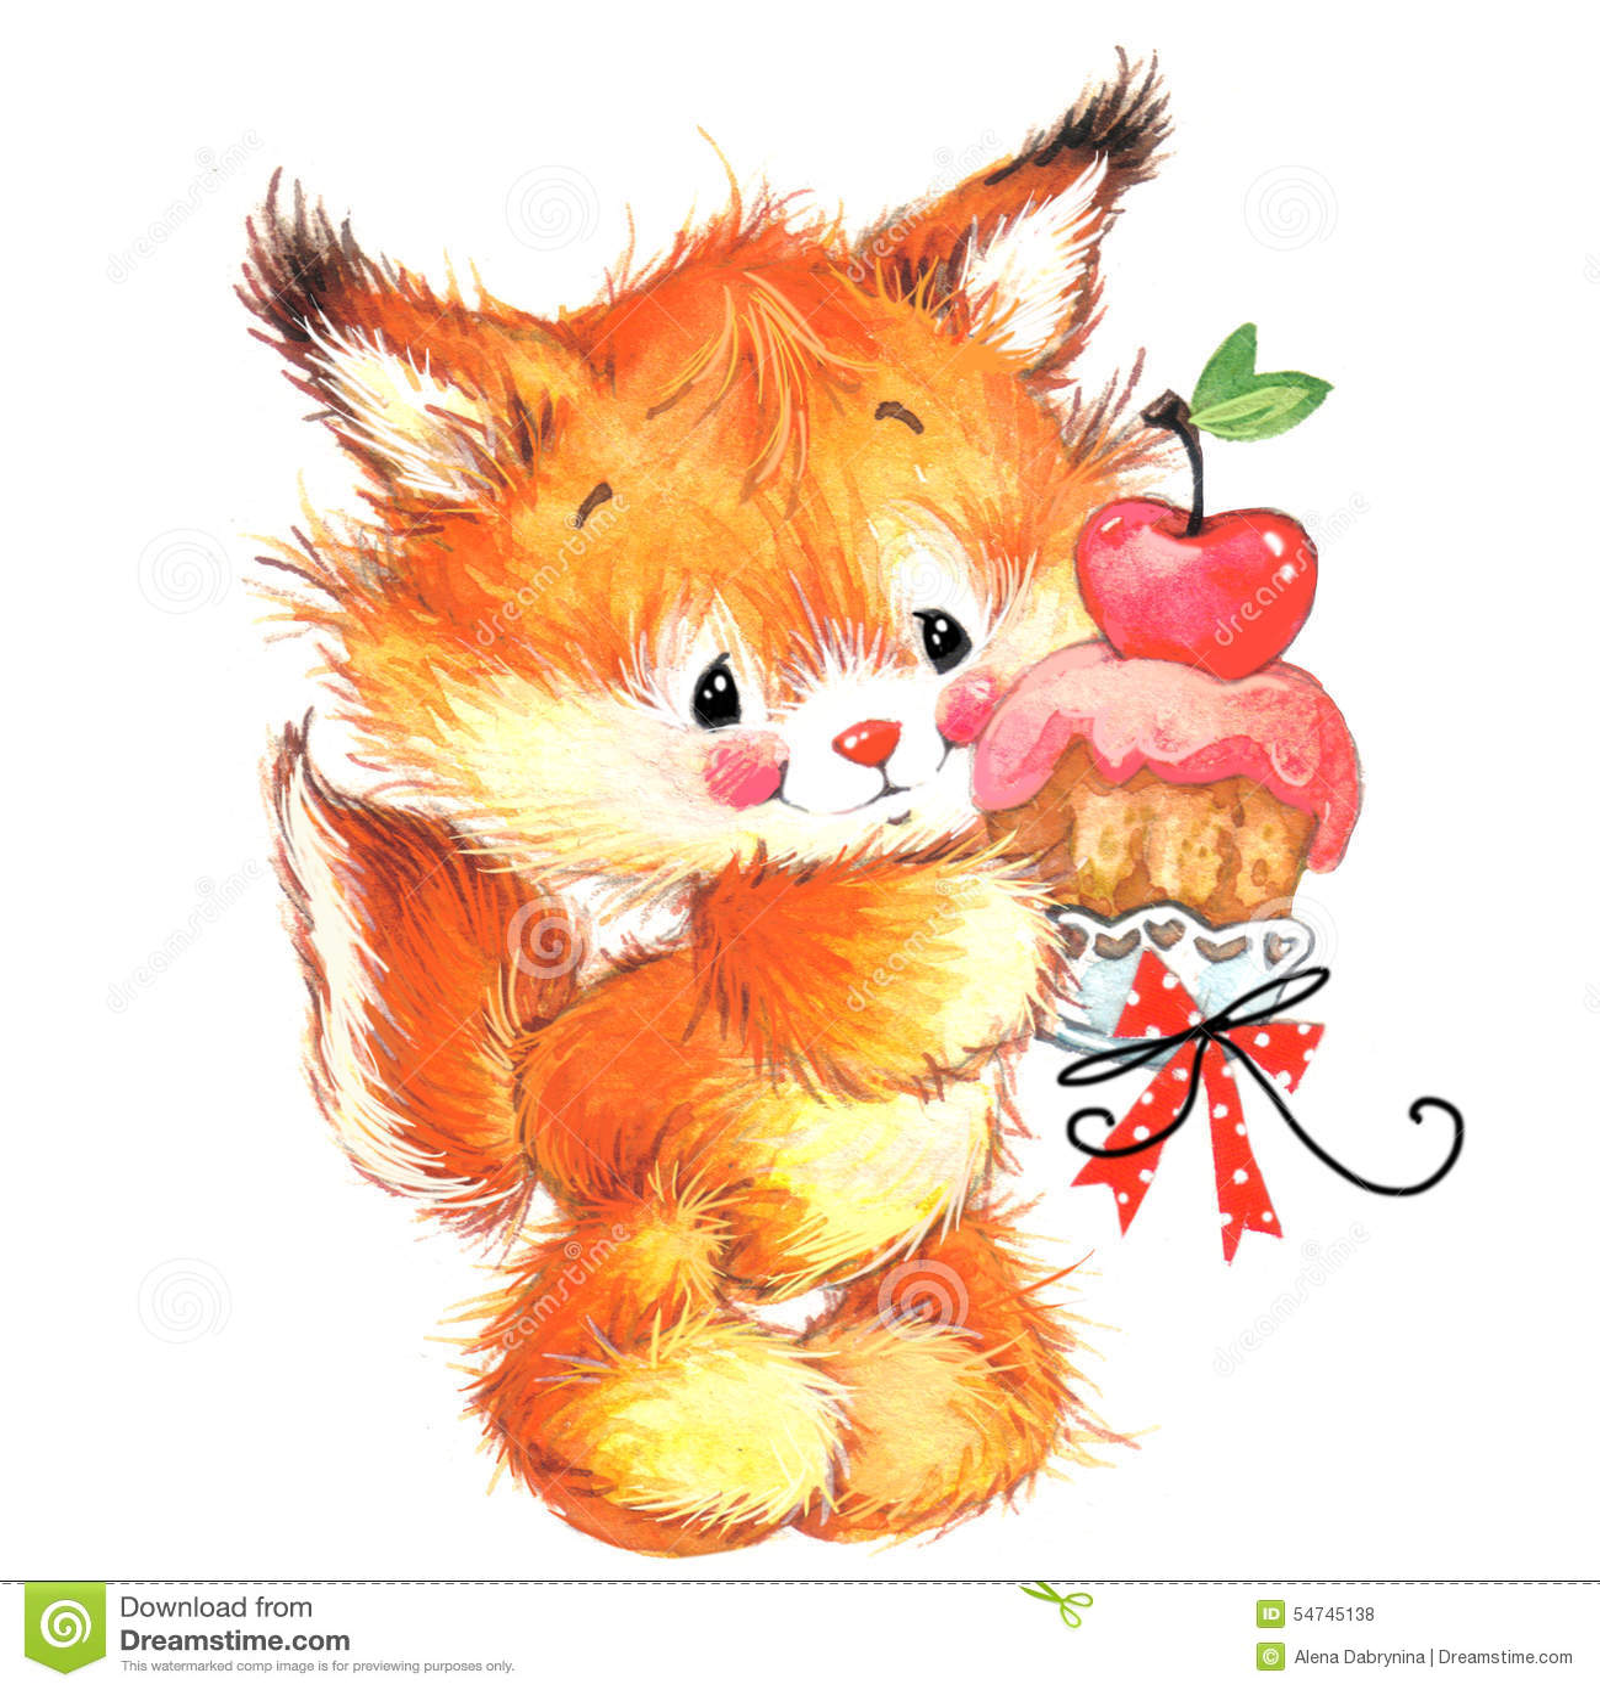 Funny Squirrel Cute Pets Watercolor Illustration Stock